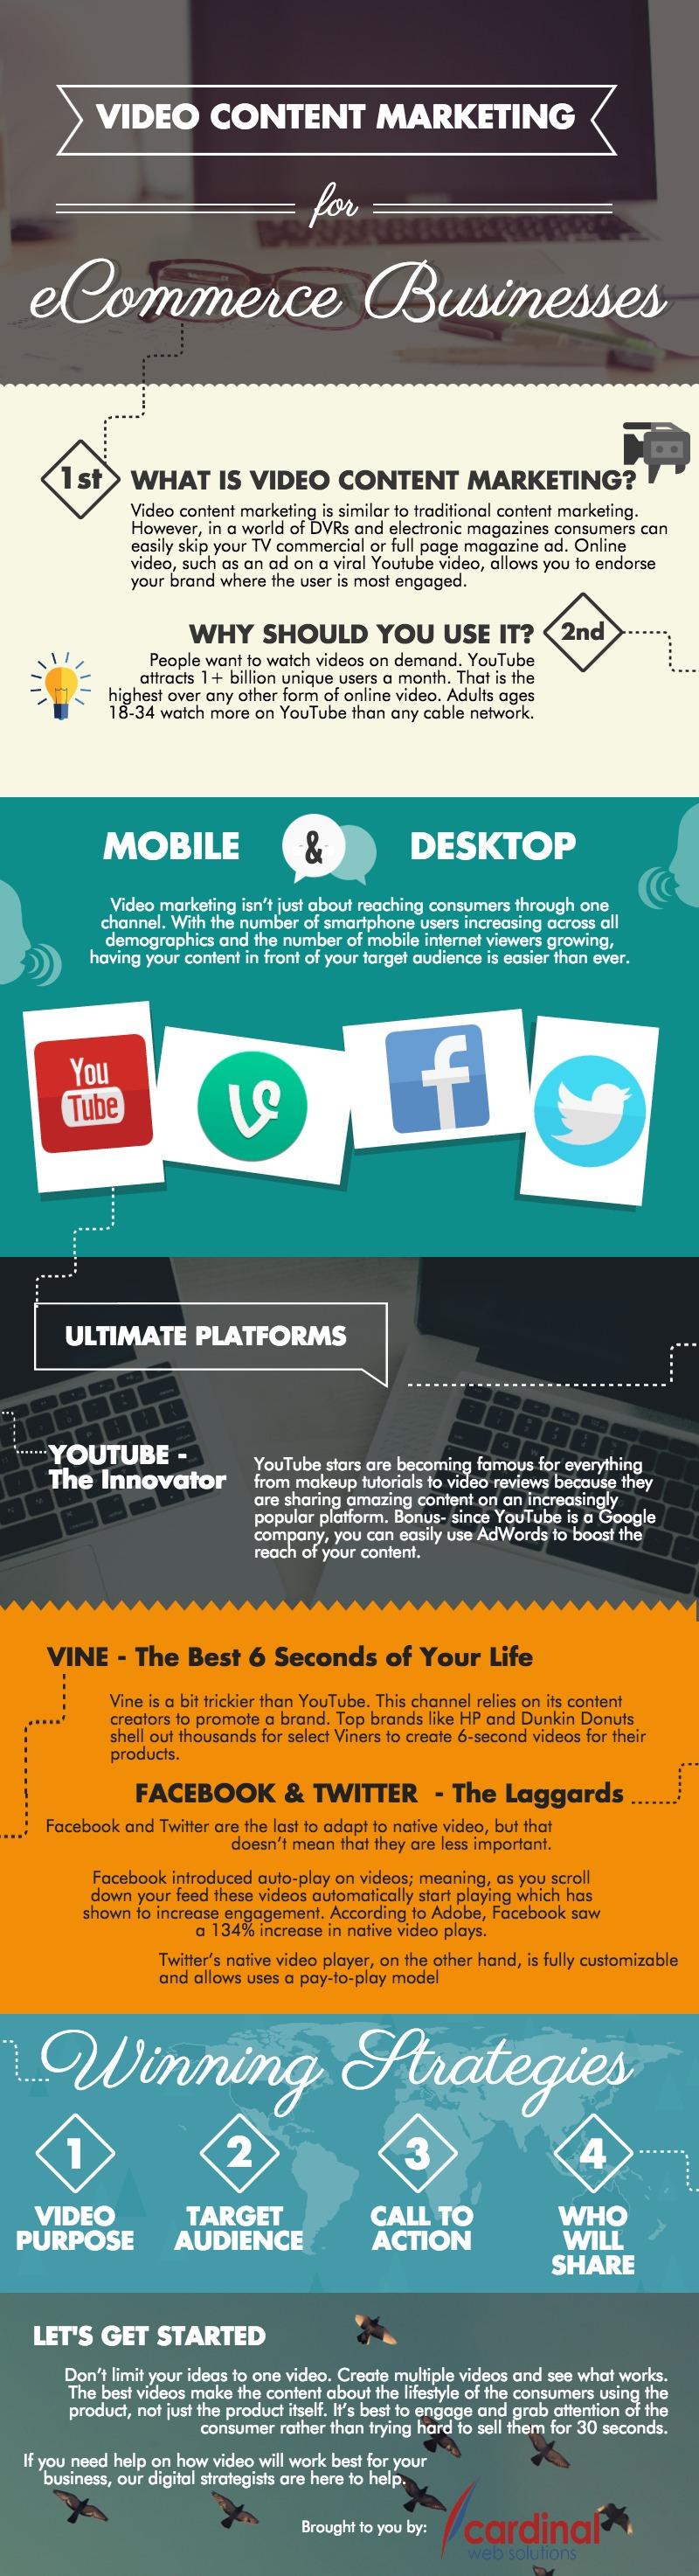 Video Content Marketing (2) (2)